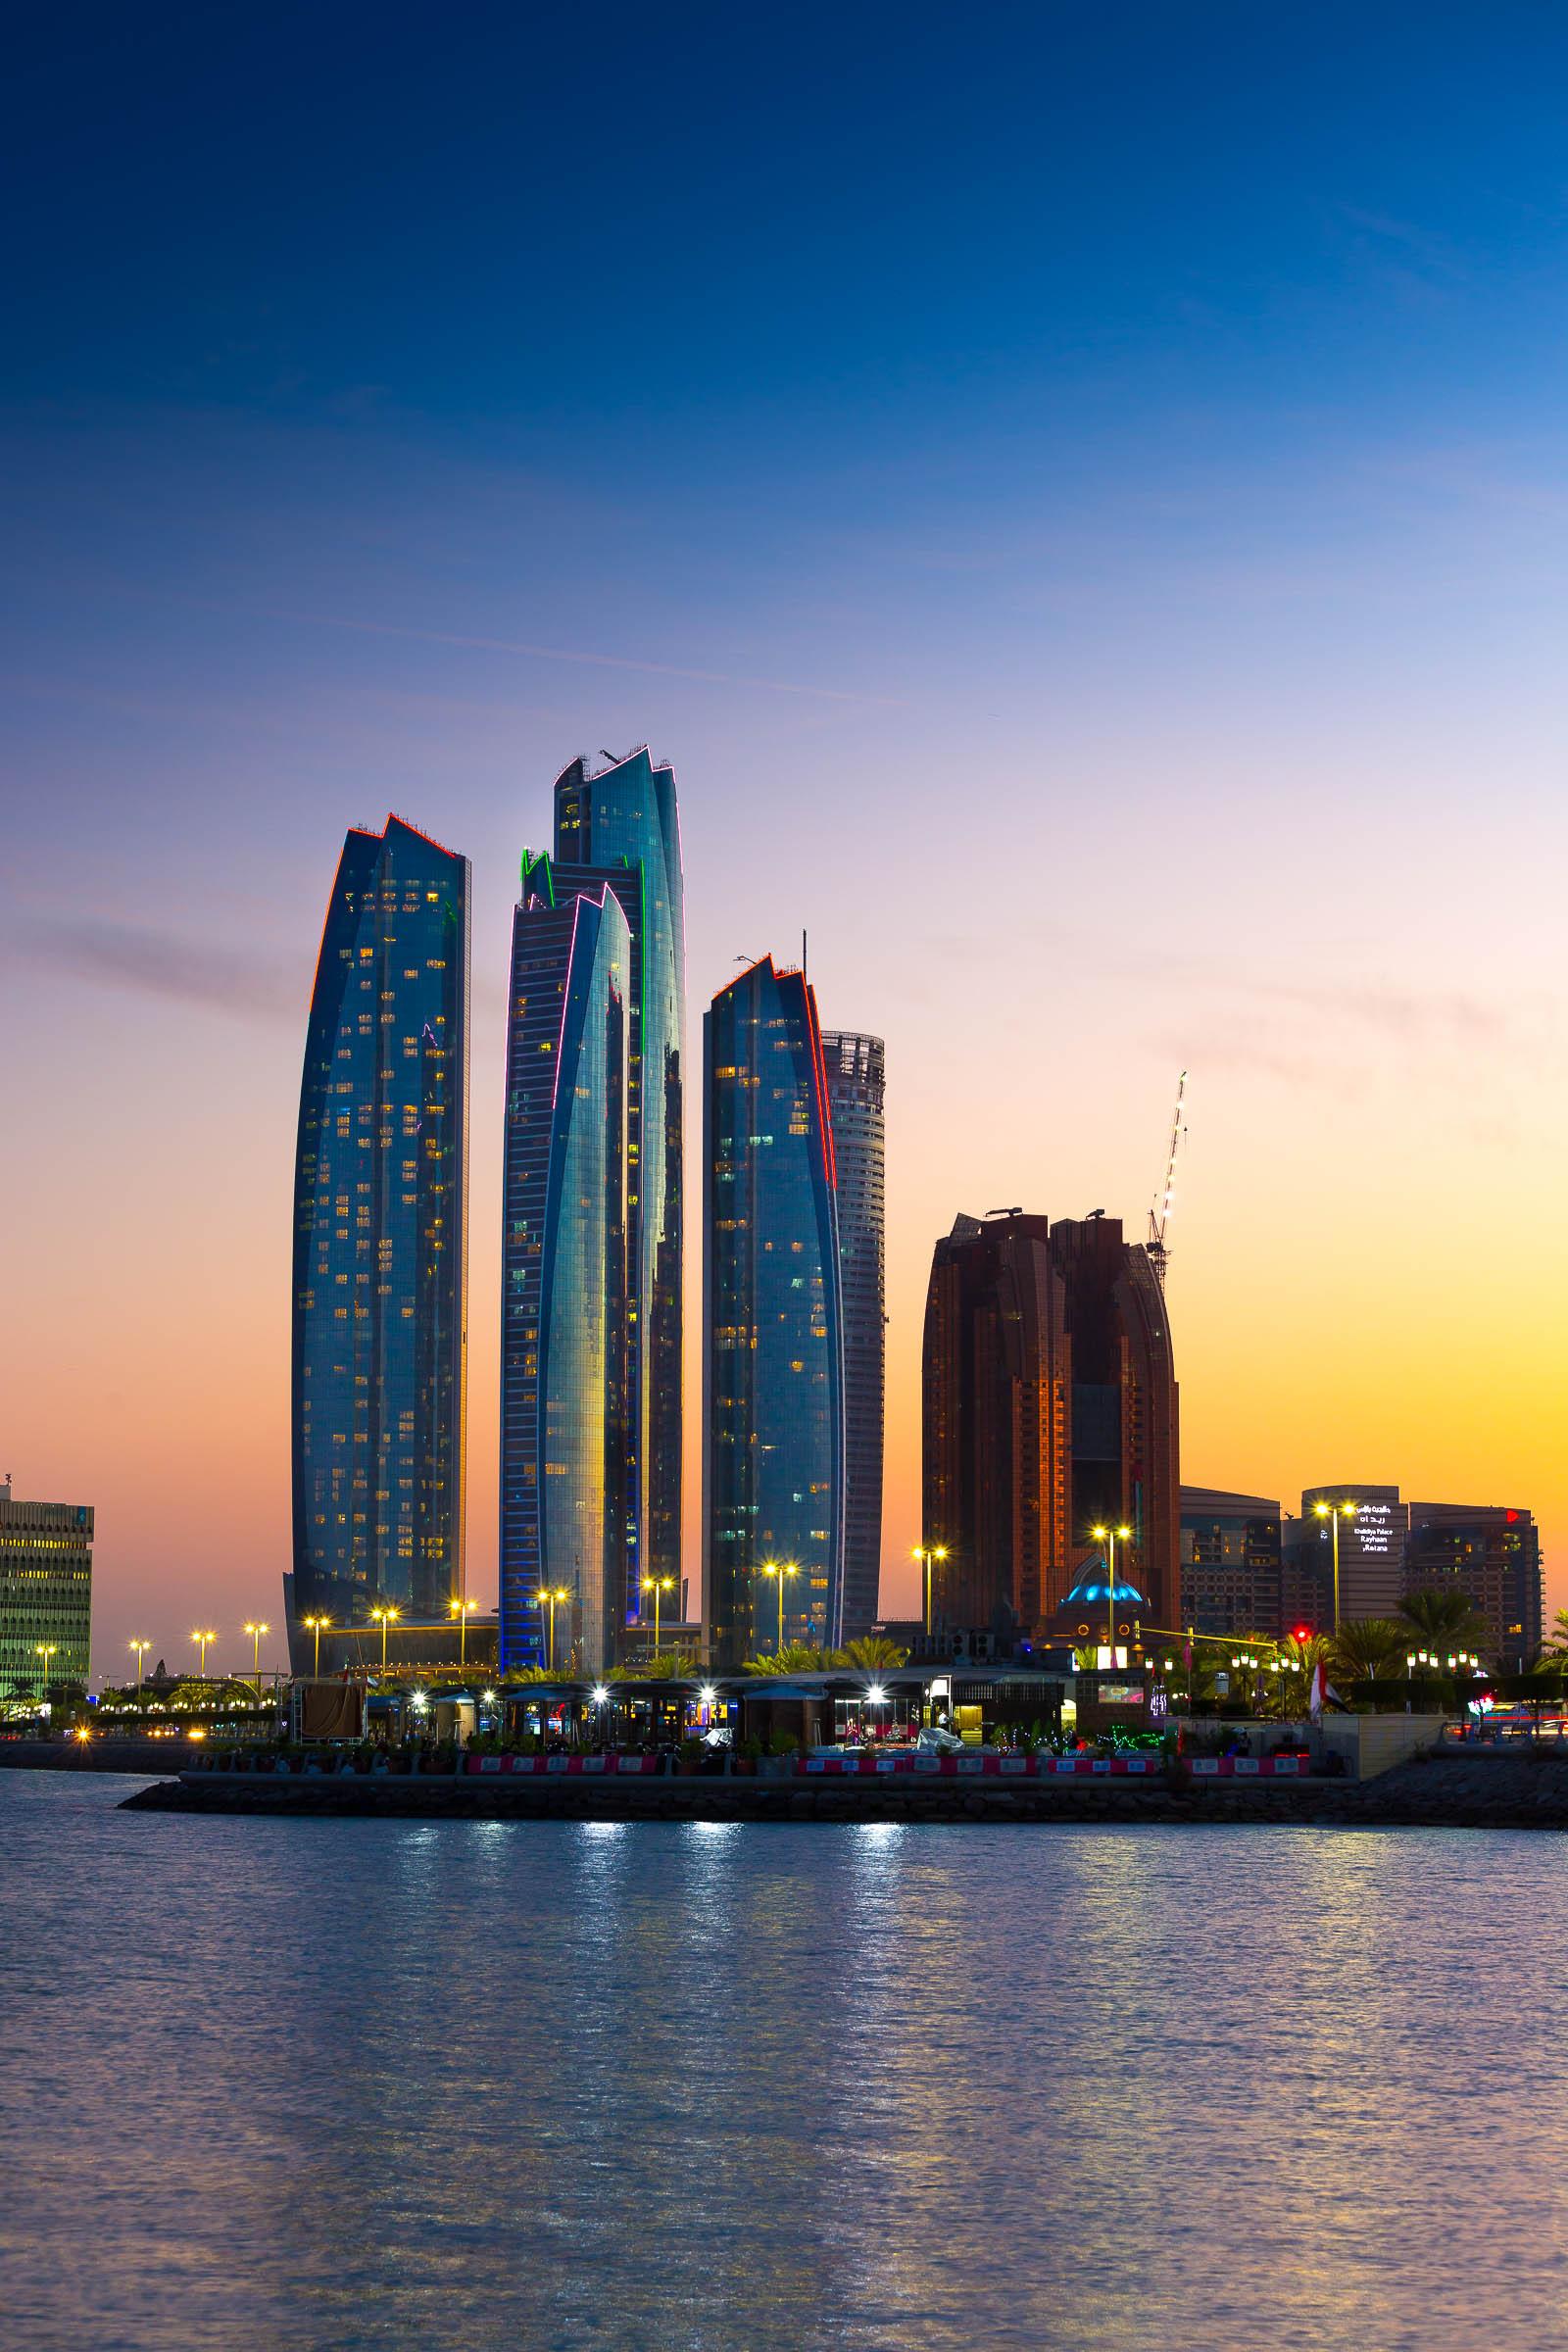 abu dhabi etihad towers skyscrapers harbour light arab emirates